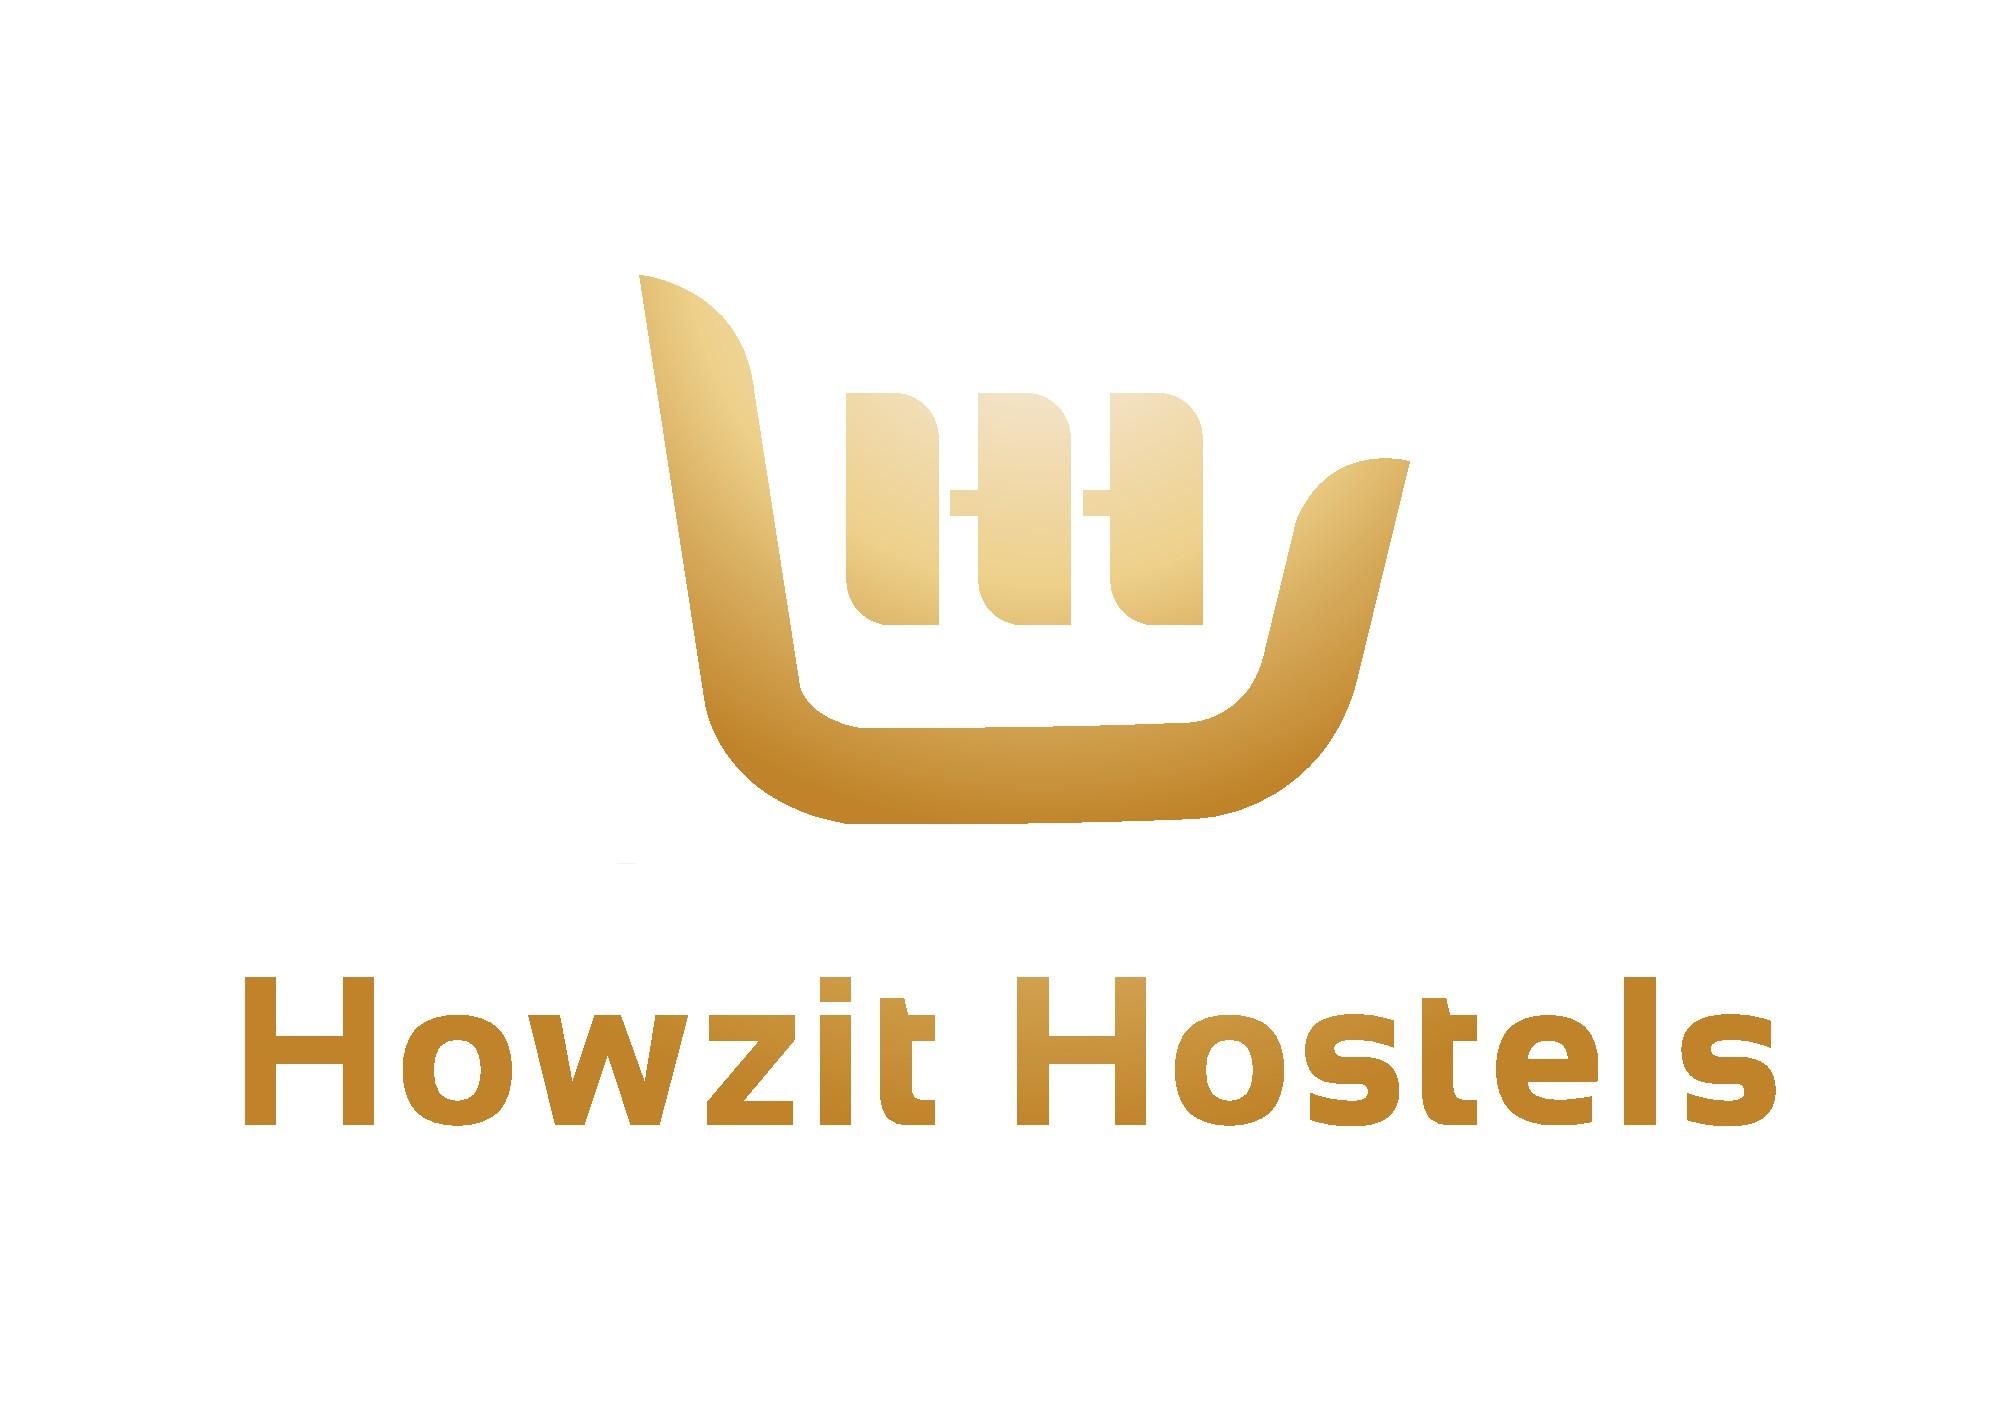 New Hostel in Hawaii needs a fun contemporary logo.